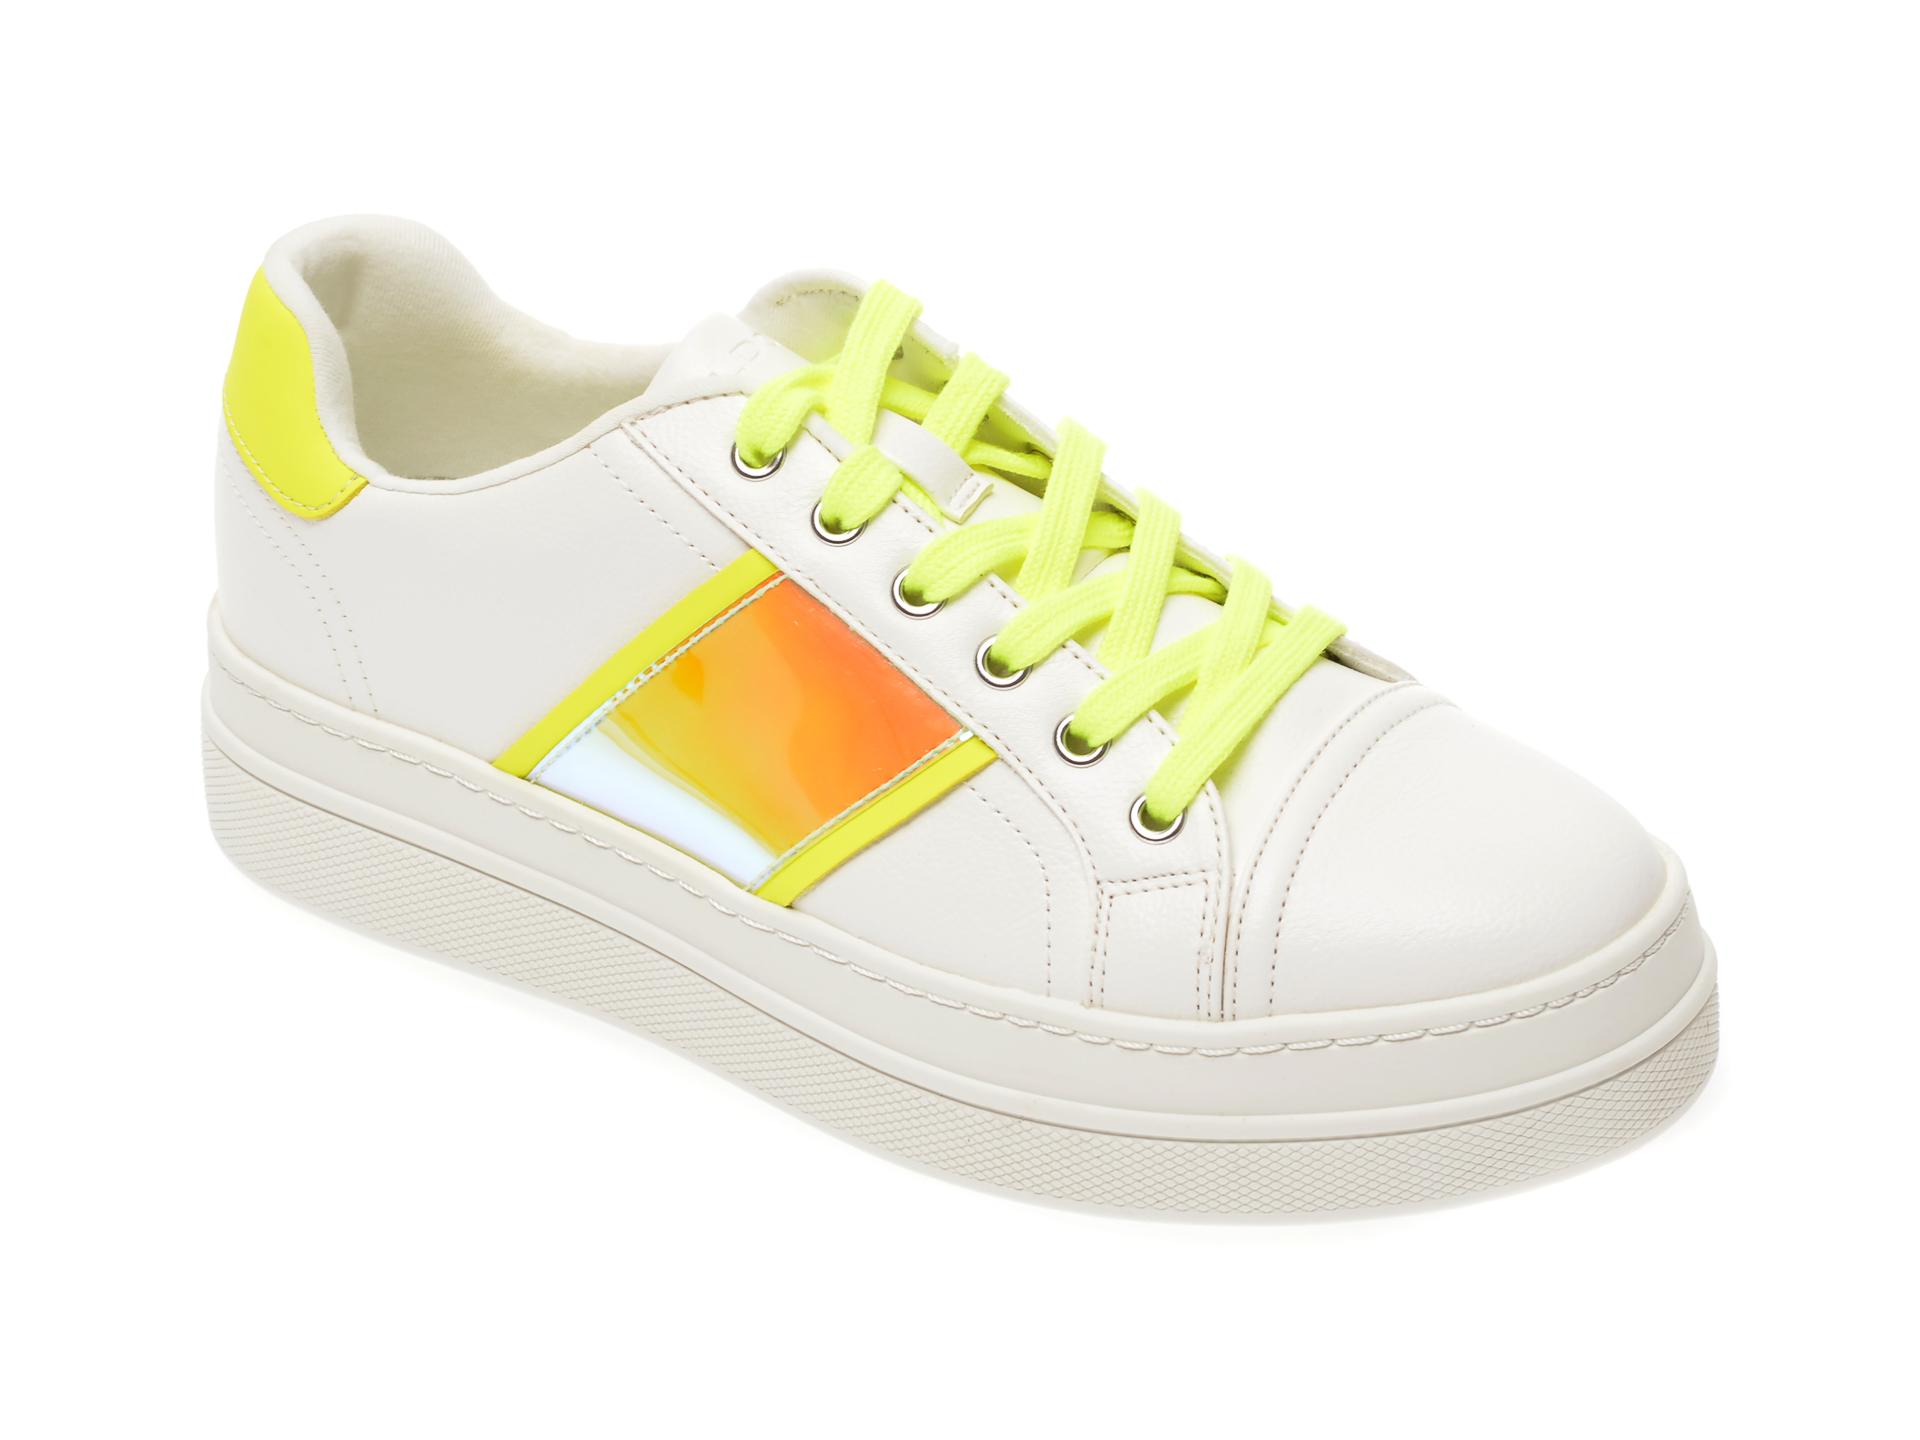 Pantofi sport ALDO albi, Starburst320, din piele ecologica